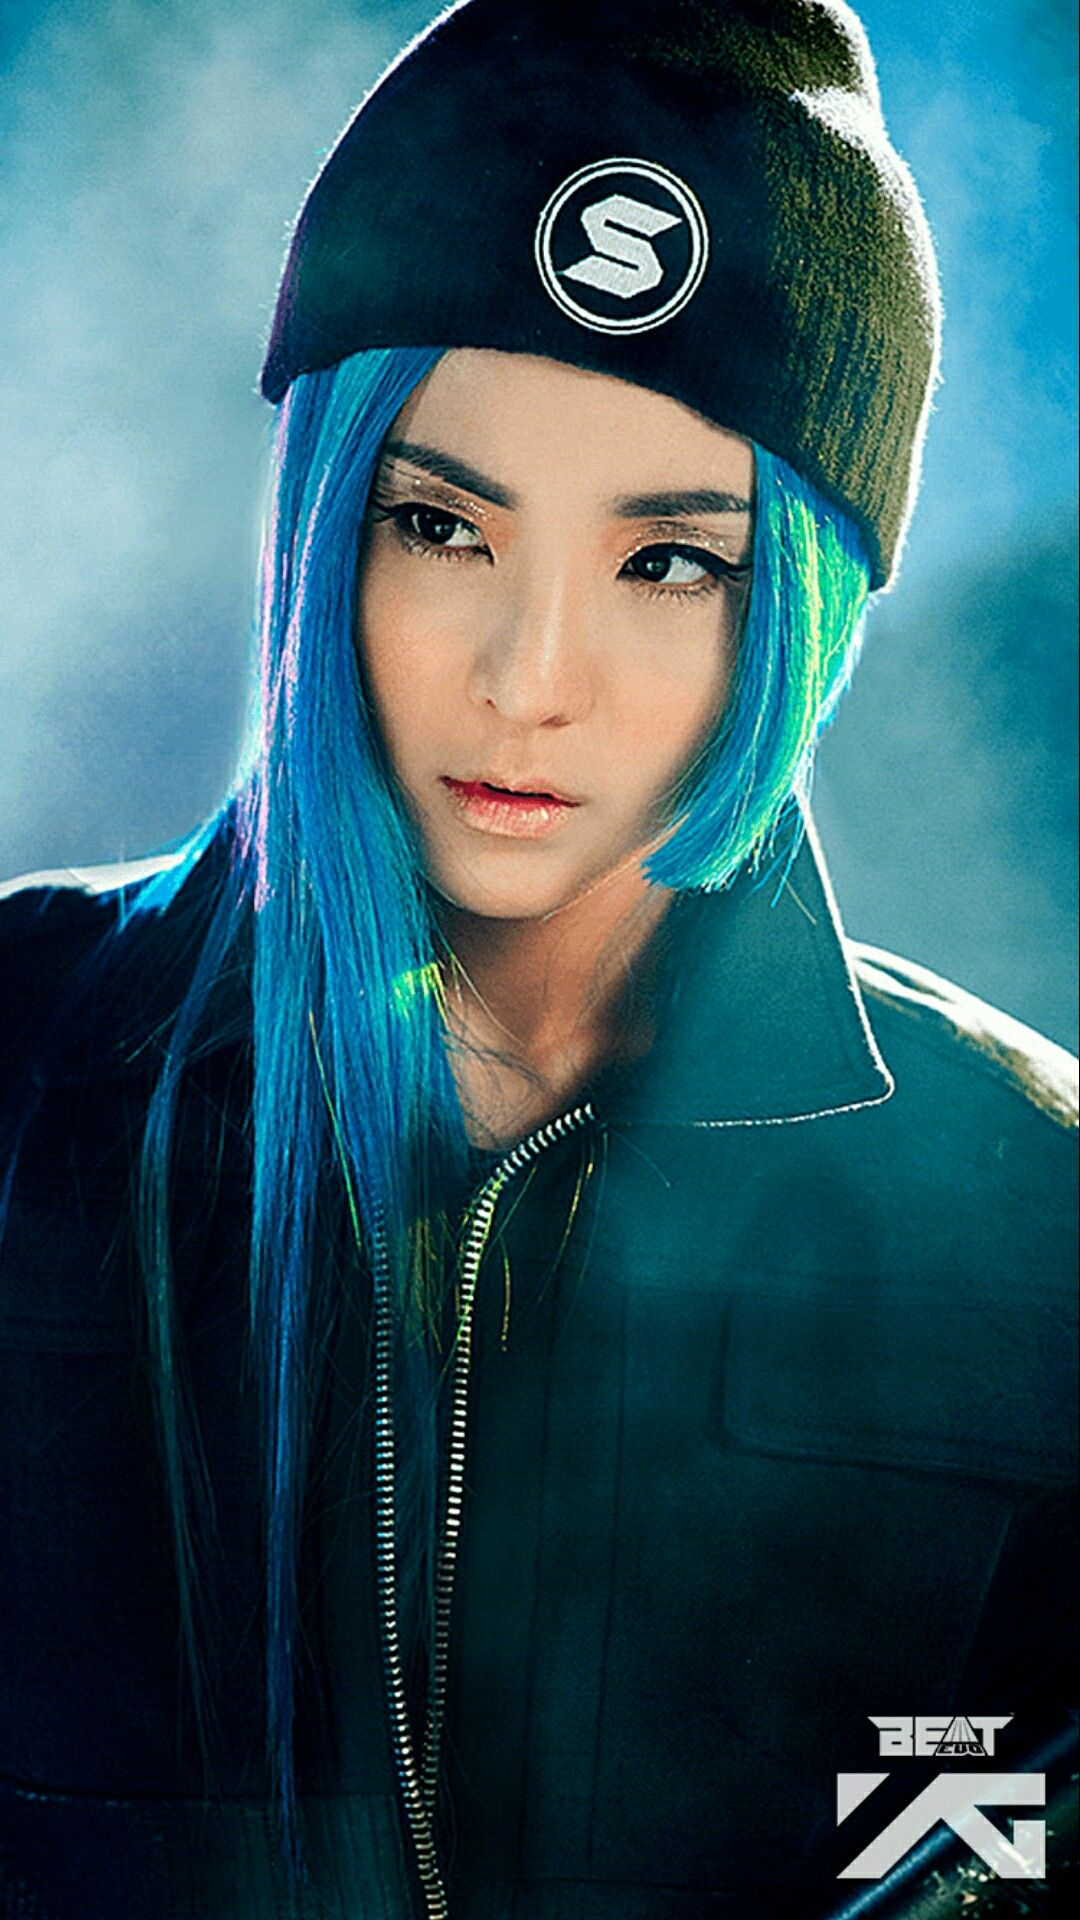 Swag with blue hair dara sandarapark wallpaper - 2ne1 come back home wallpaper ...